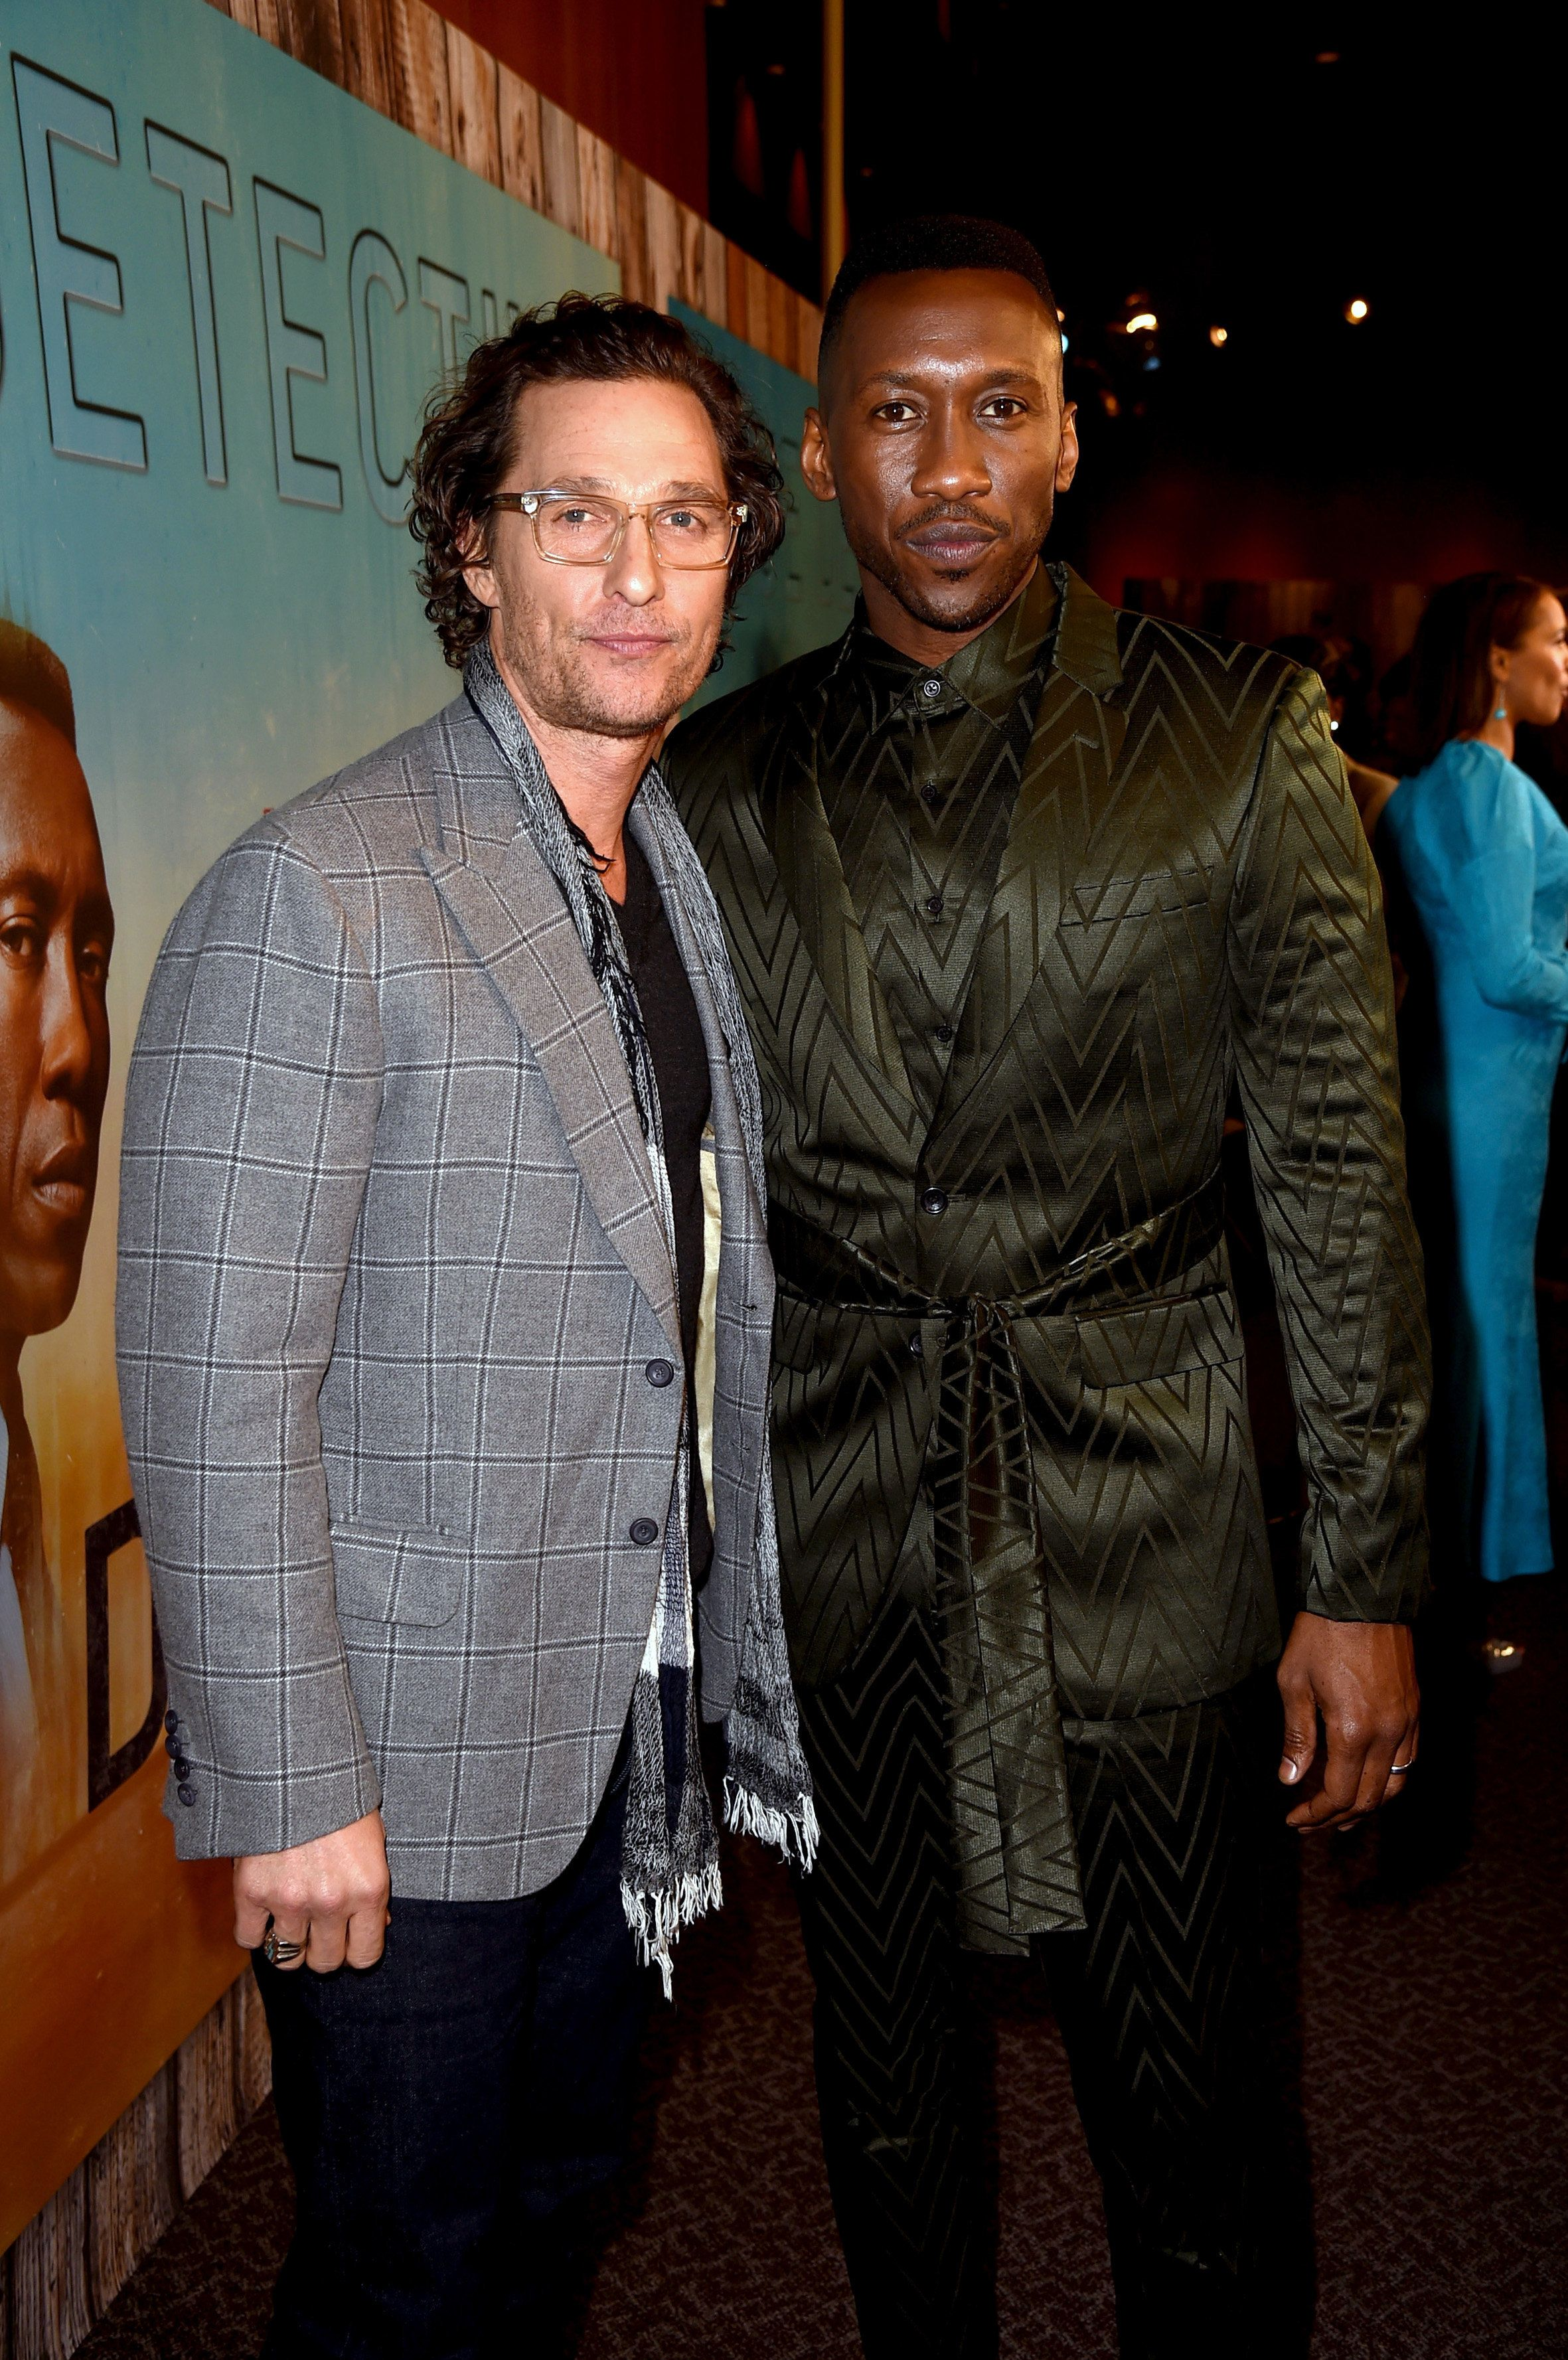 HBO's 'True Detective' Series 3 Premieres In Los